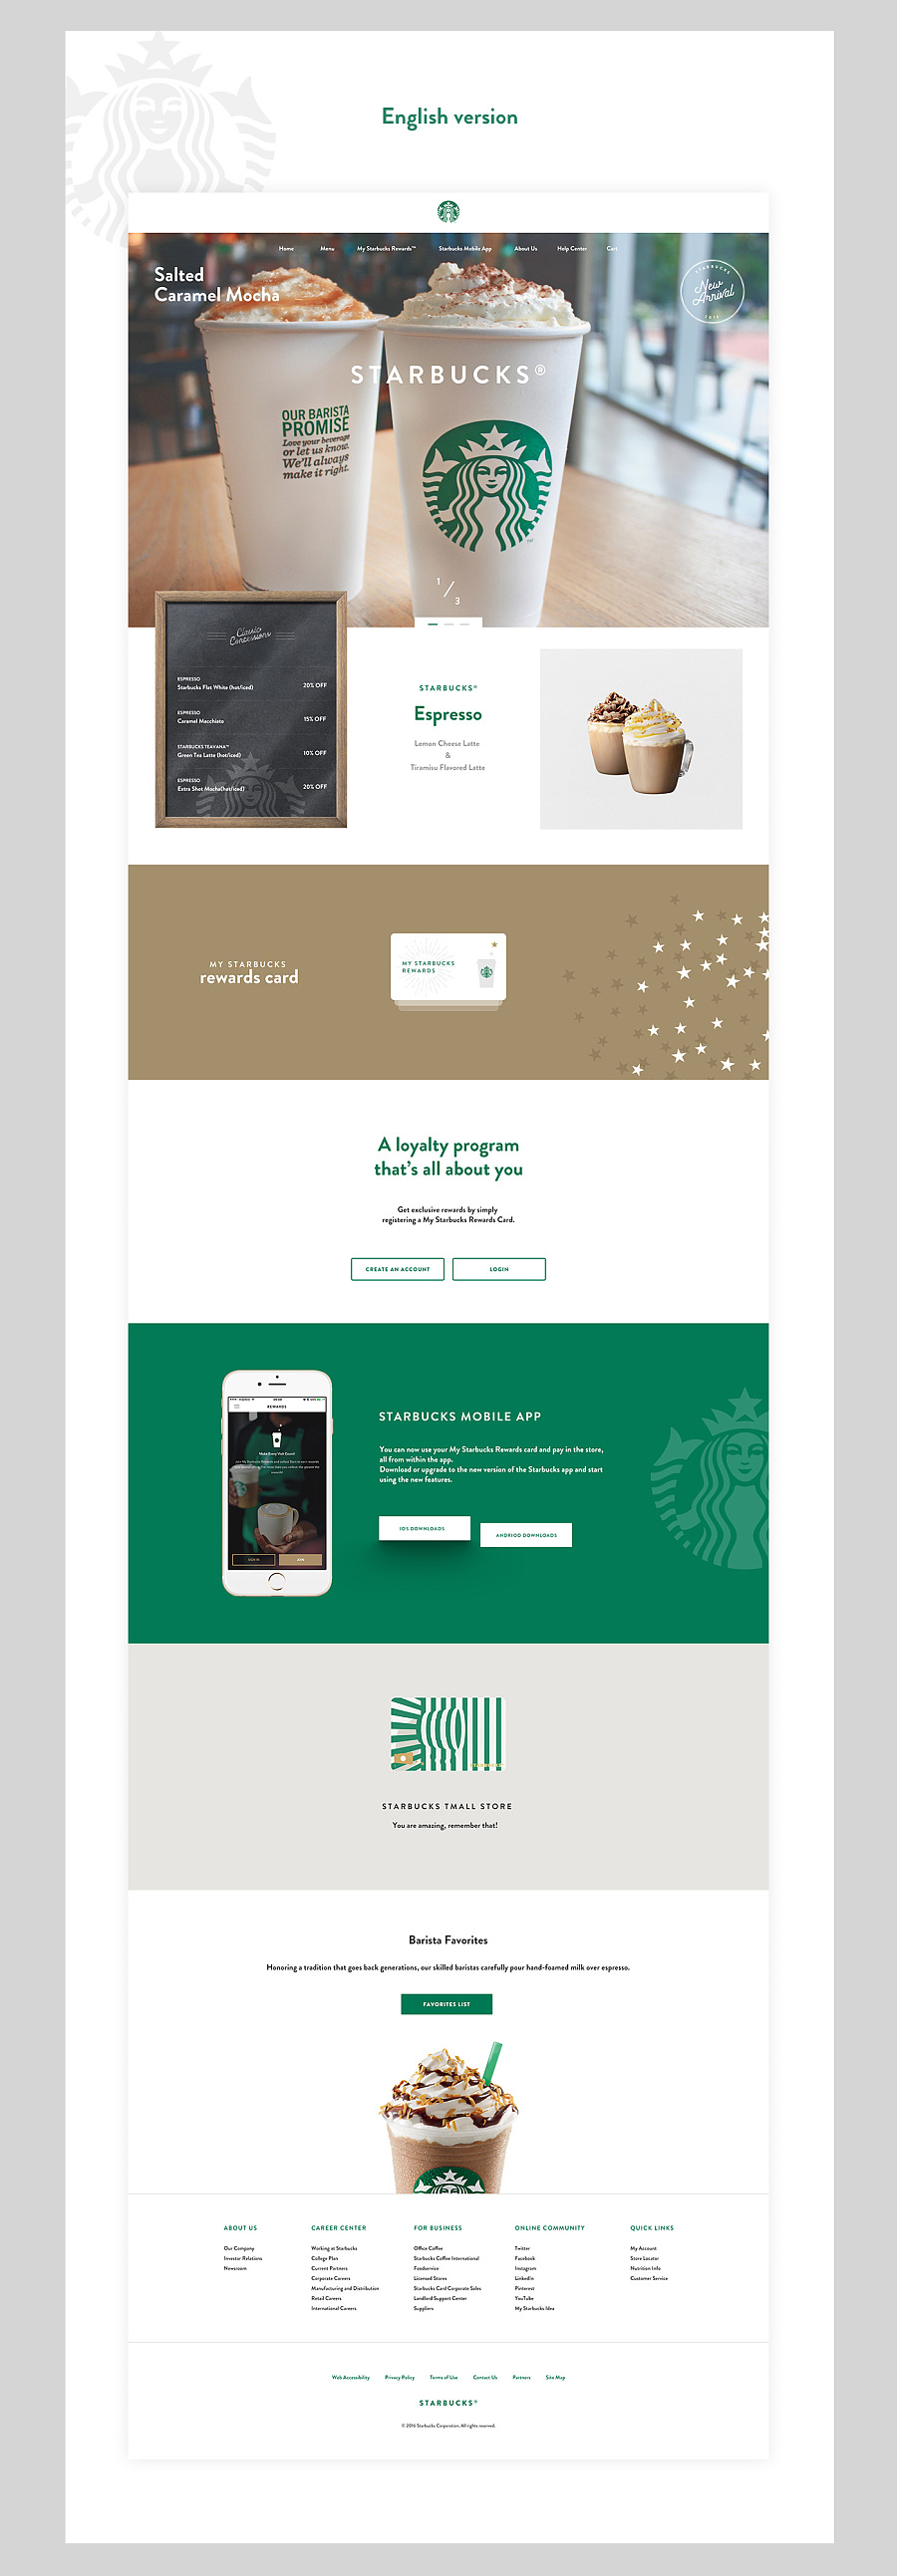 查看《Starbucks some redesign》原图,原图尺寸:1400x4023